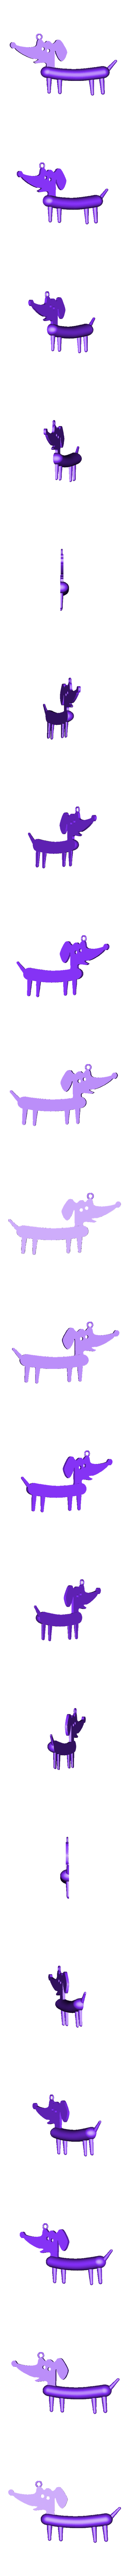 20.stl Download STL file Dogs • 3D printing object, GENNADI3313